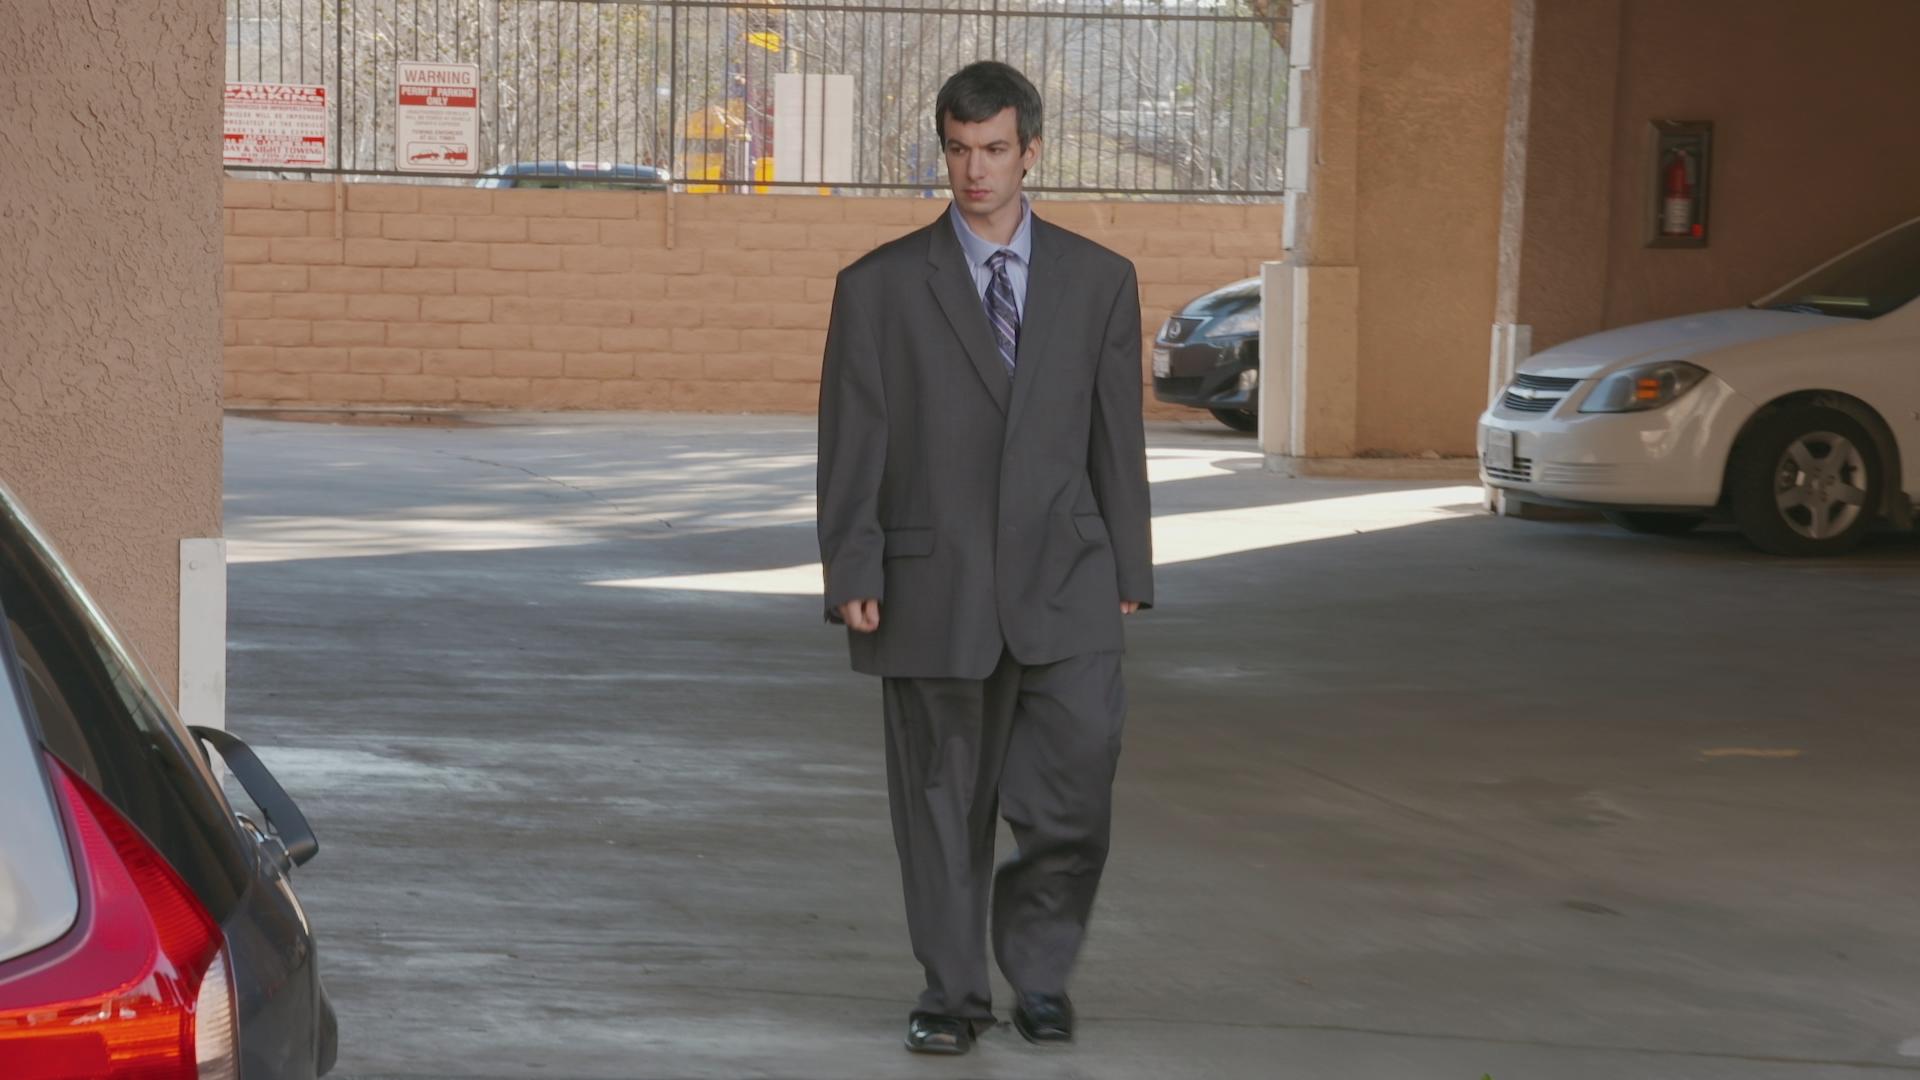 nathan-for-you-season-4-suit